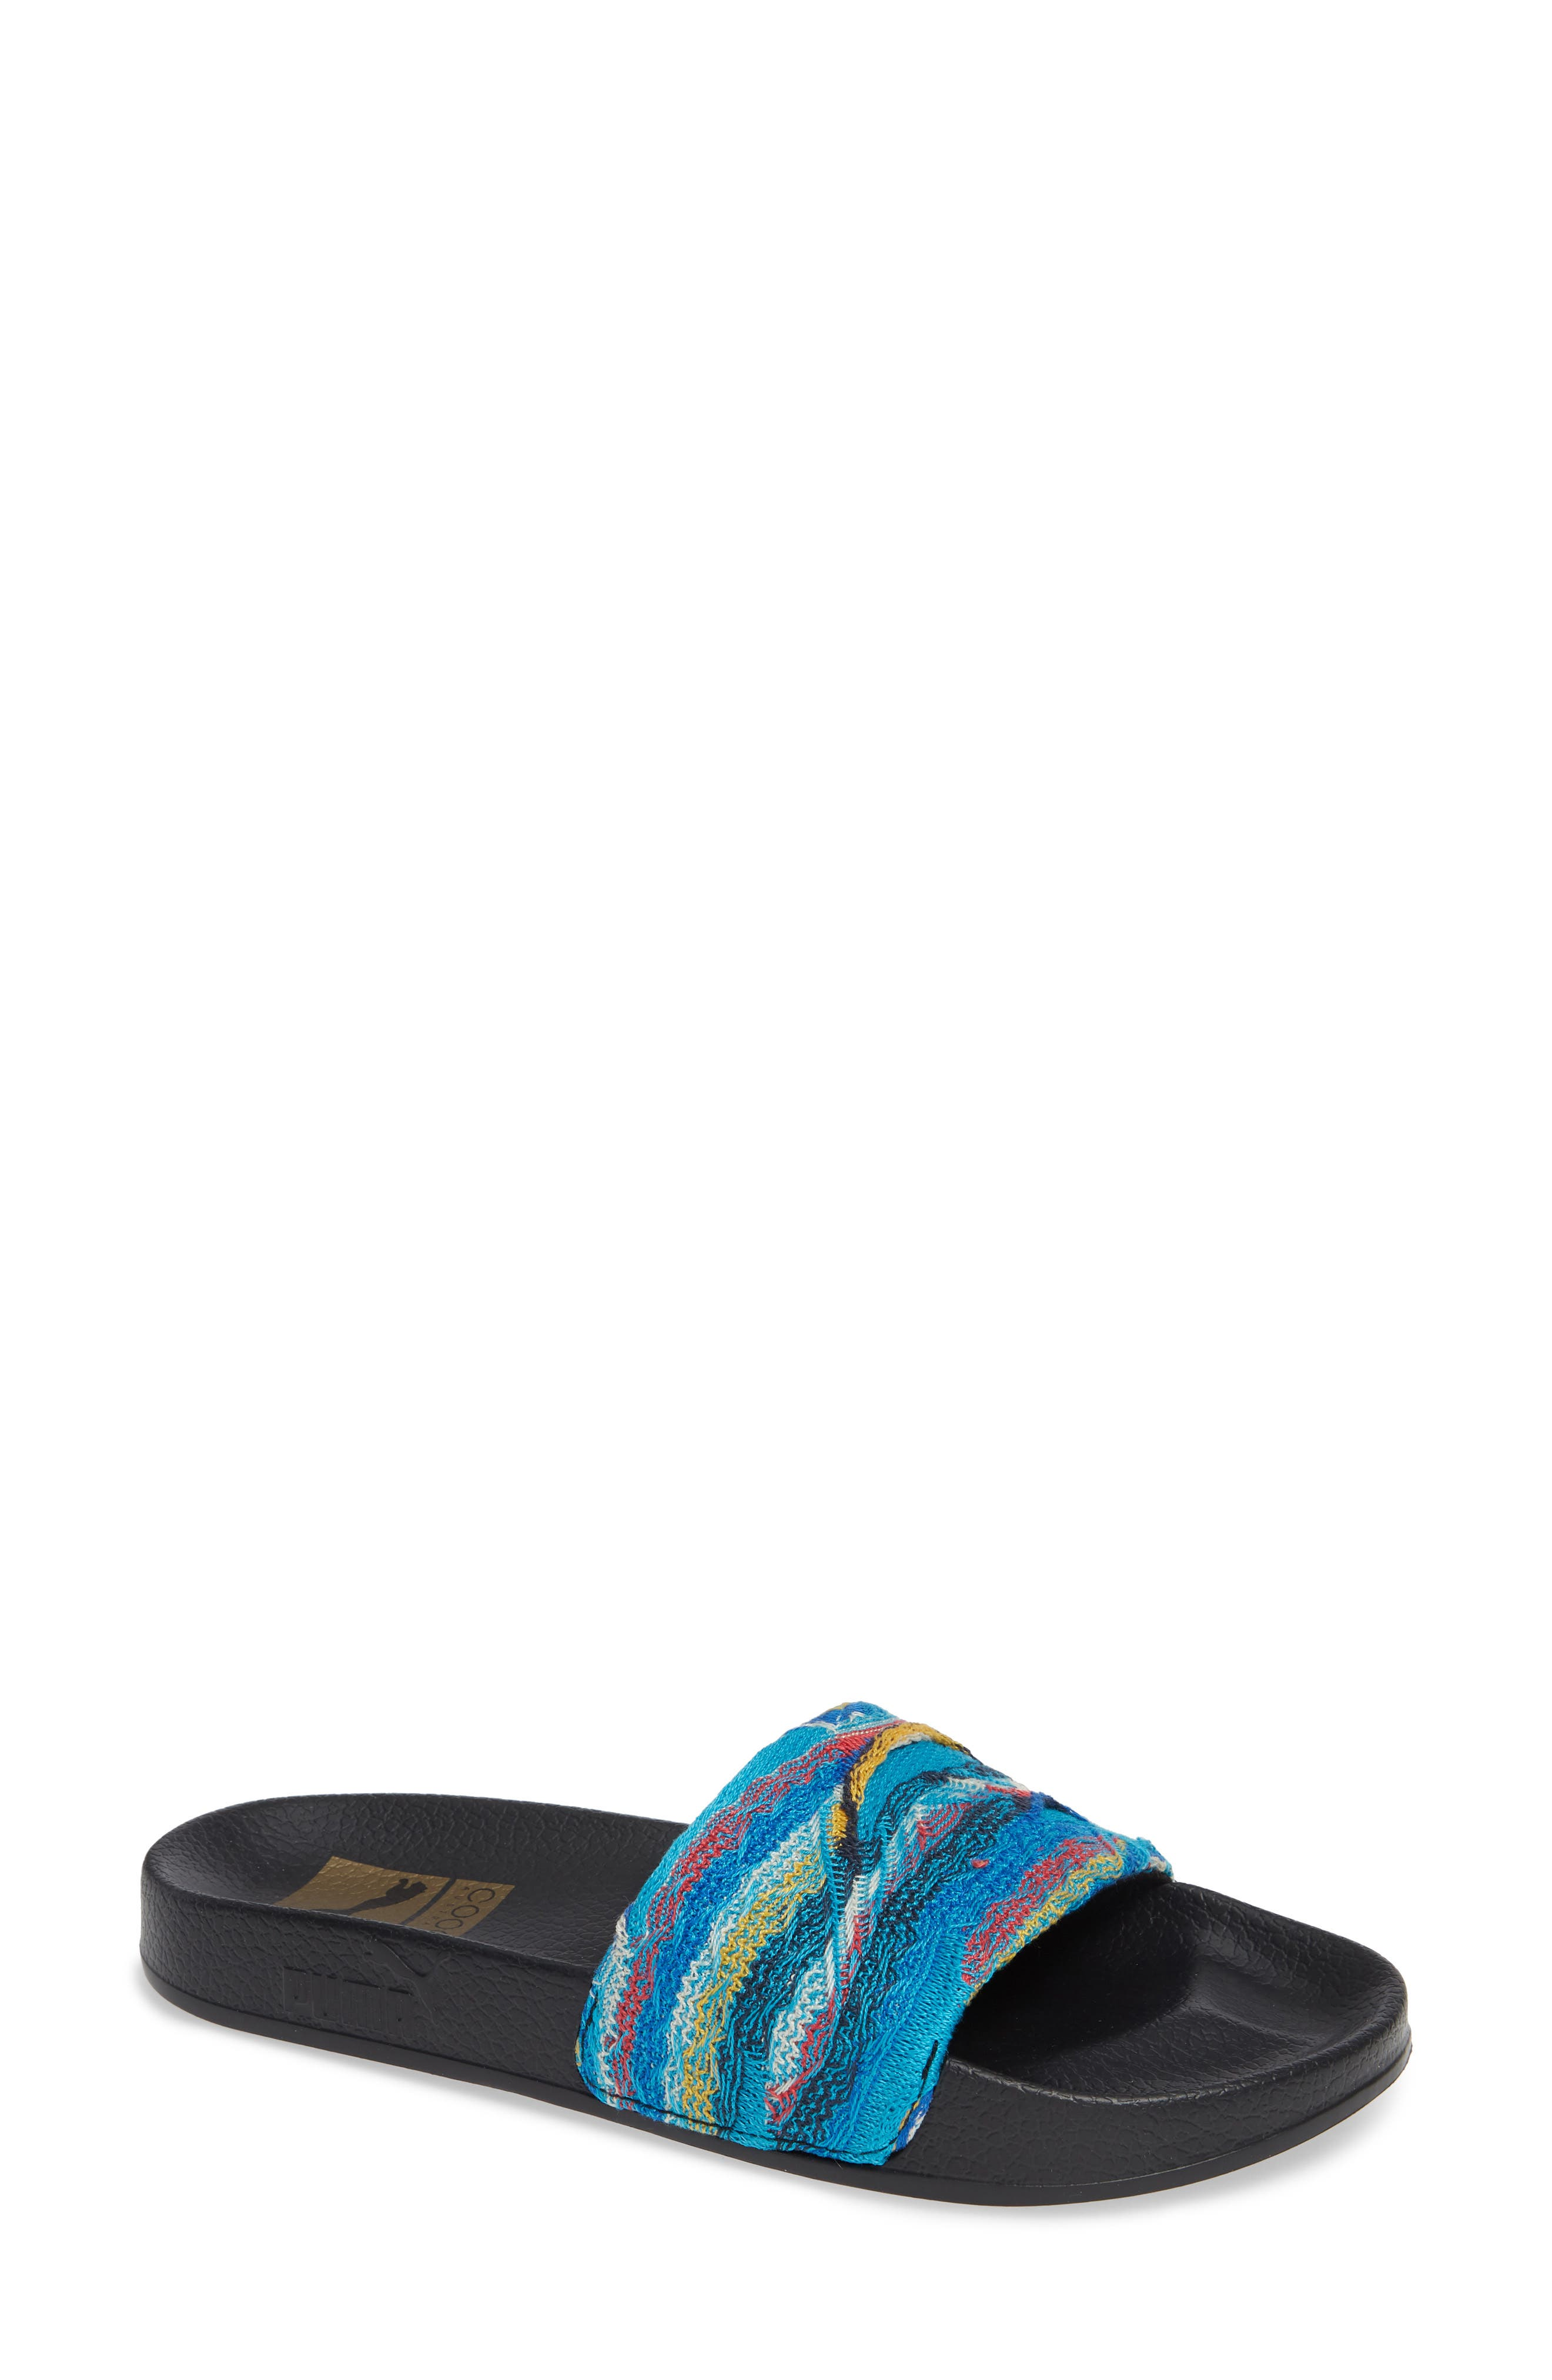 Leadcat Coogie Slide Sandal,                         Main,                         color, ISLAND PARADISE/ PUMA BLACK